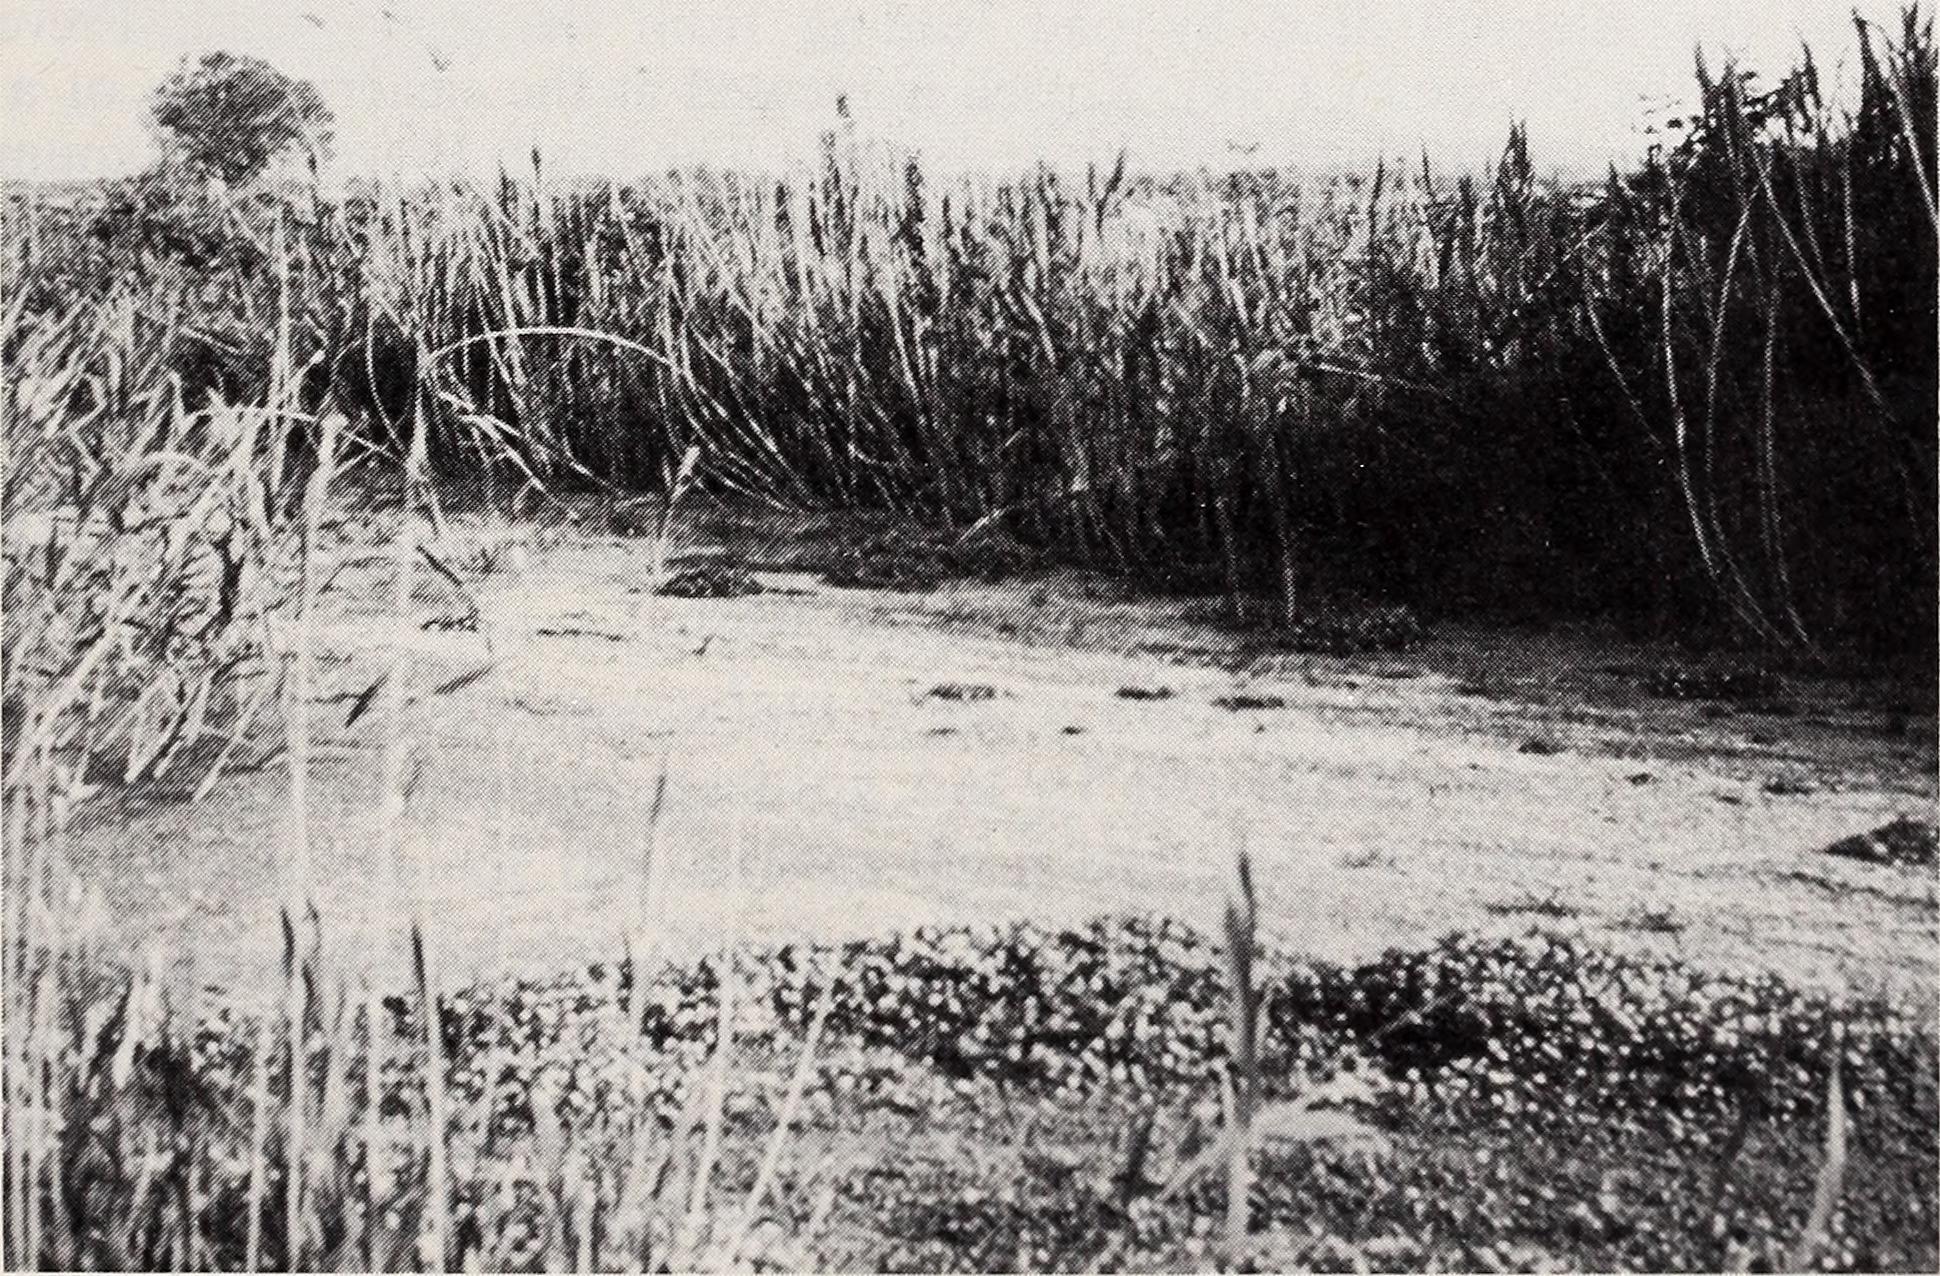 Image of Corfu toothcarp